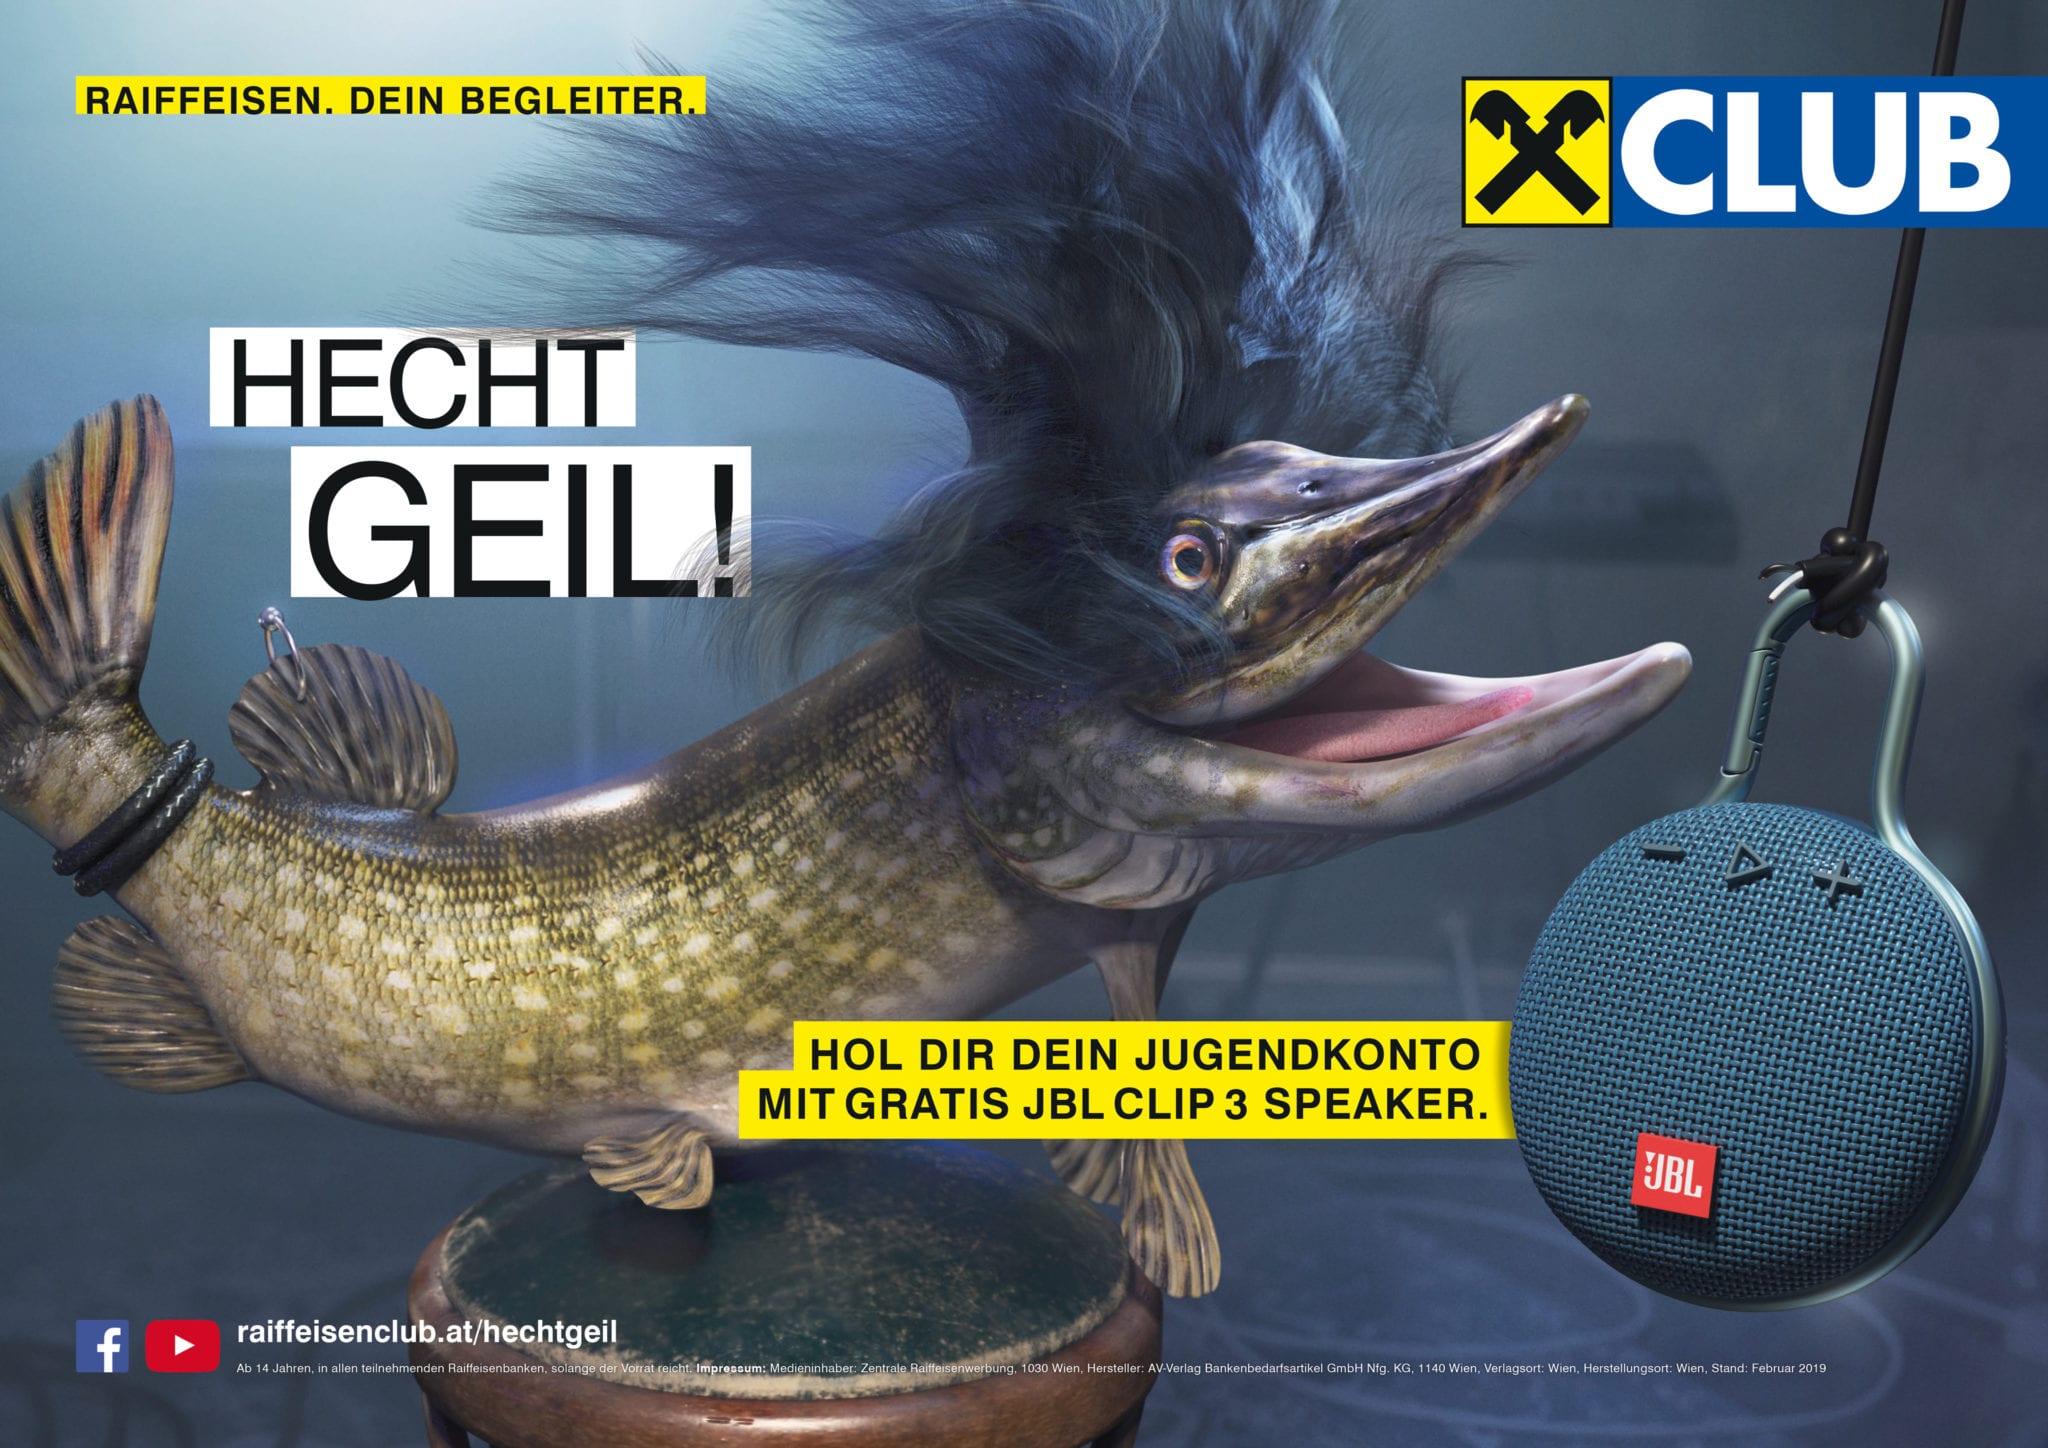 OGILVY - Marcus Hornek // Sebastian Kainz // Client: Raiffeisen Club // 2019